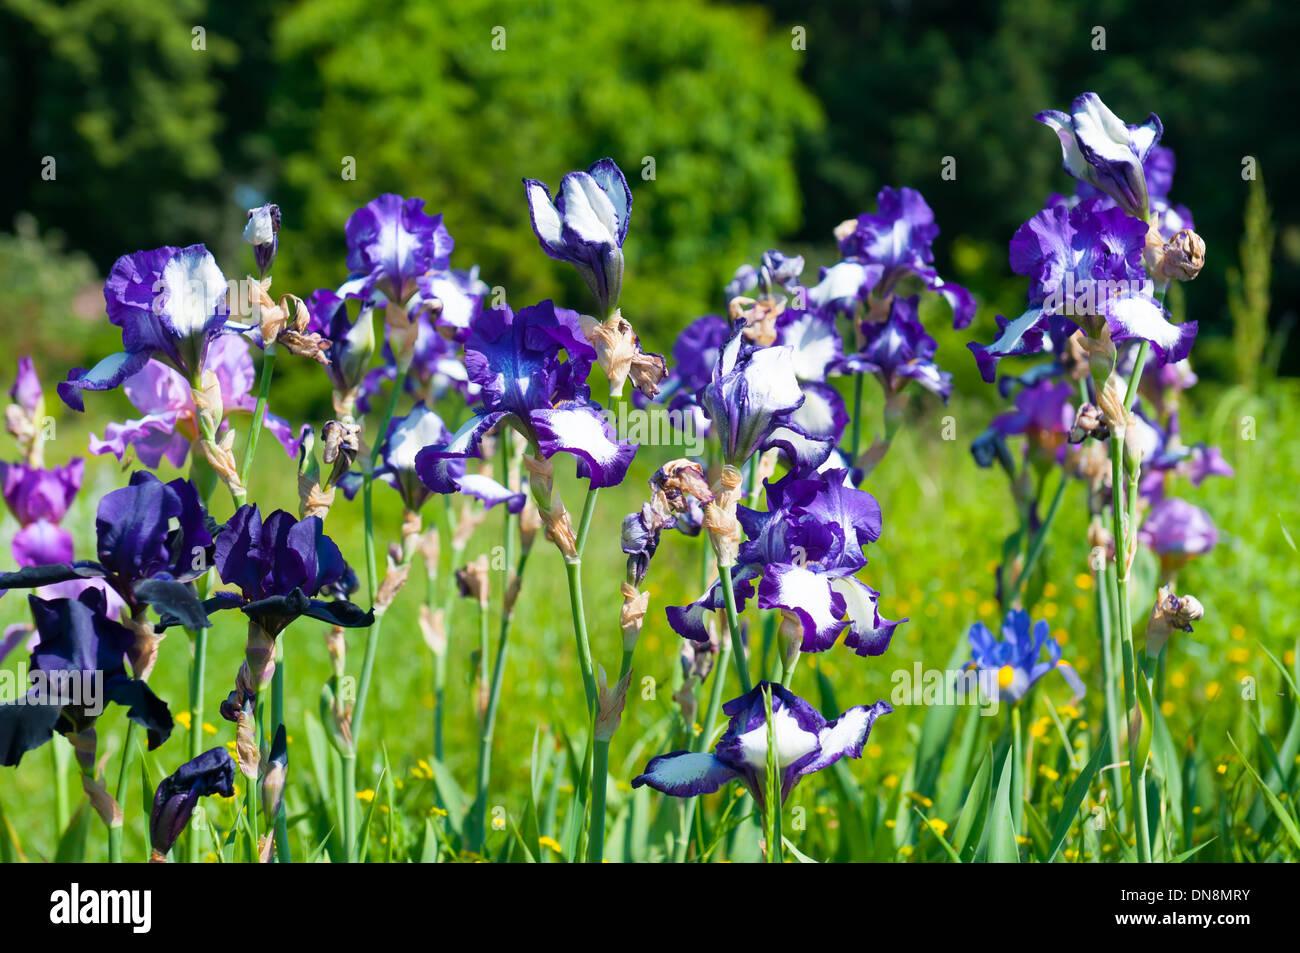 Blue irises blossoming in a garden closeup of iris flower stock blue irises blossoming in a garden closeup of iris flower izmirmasajfo